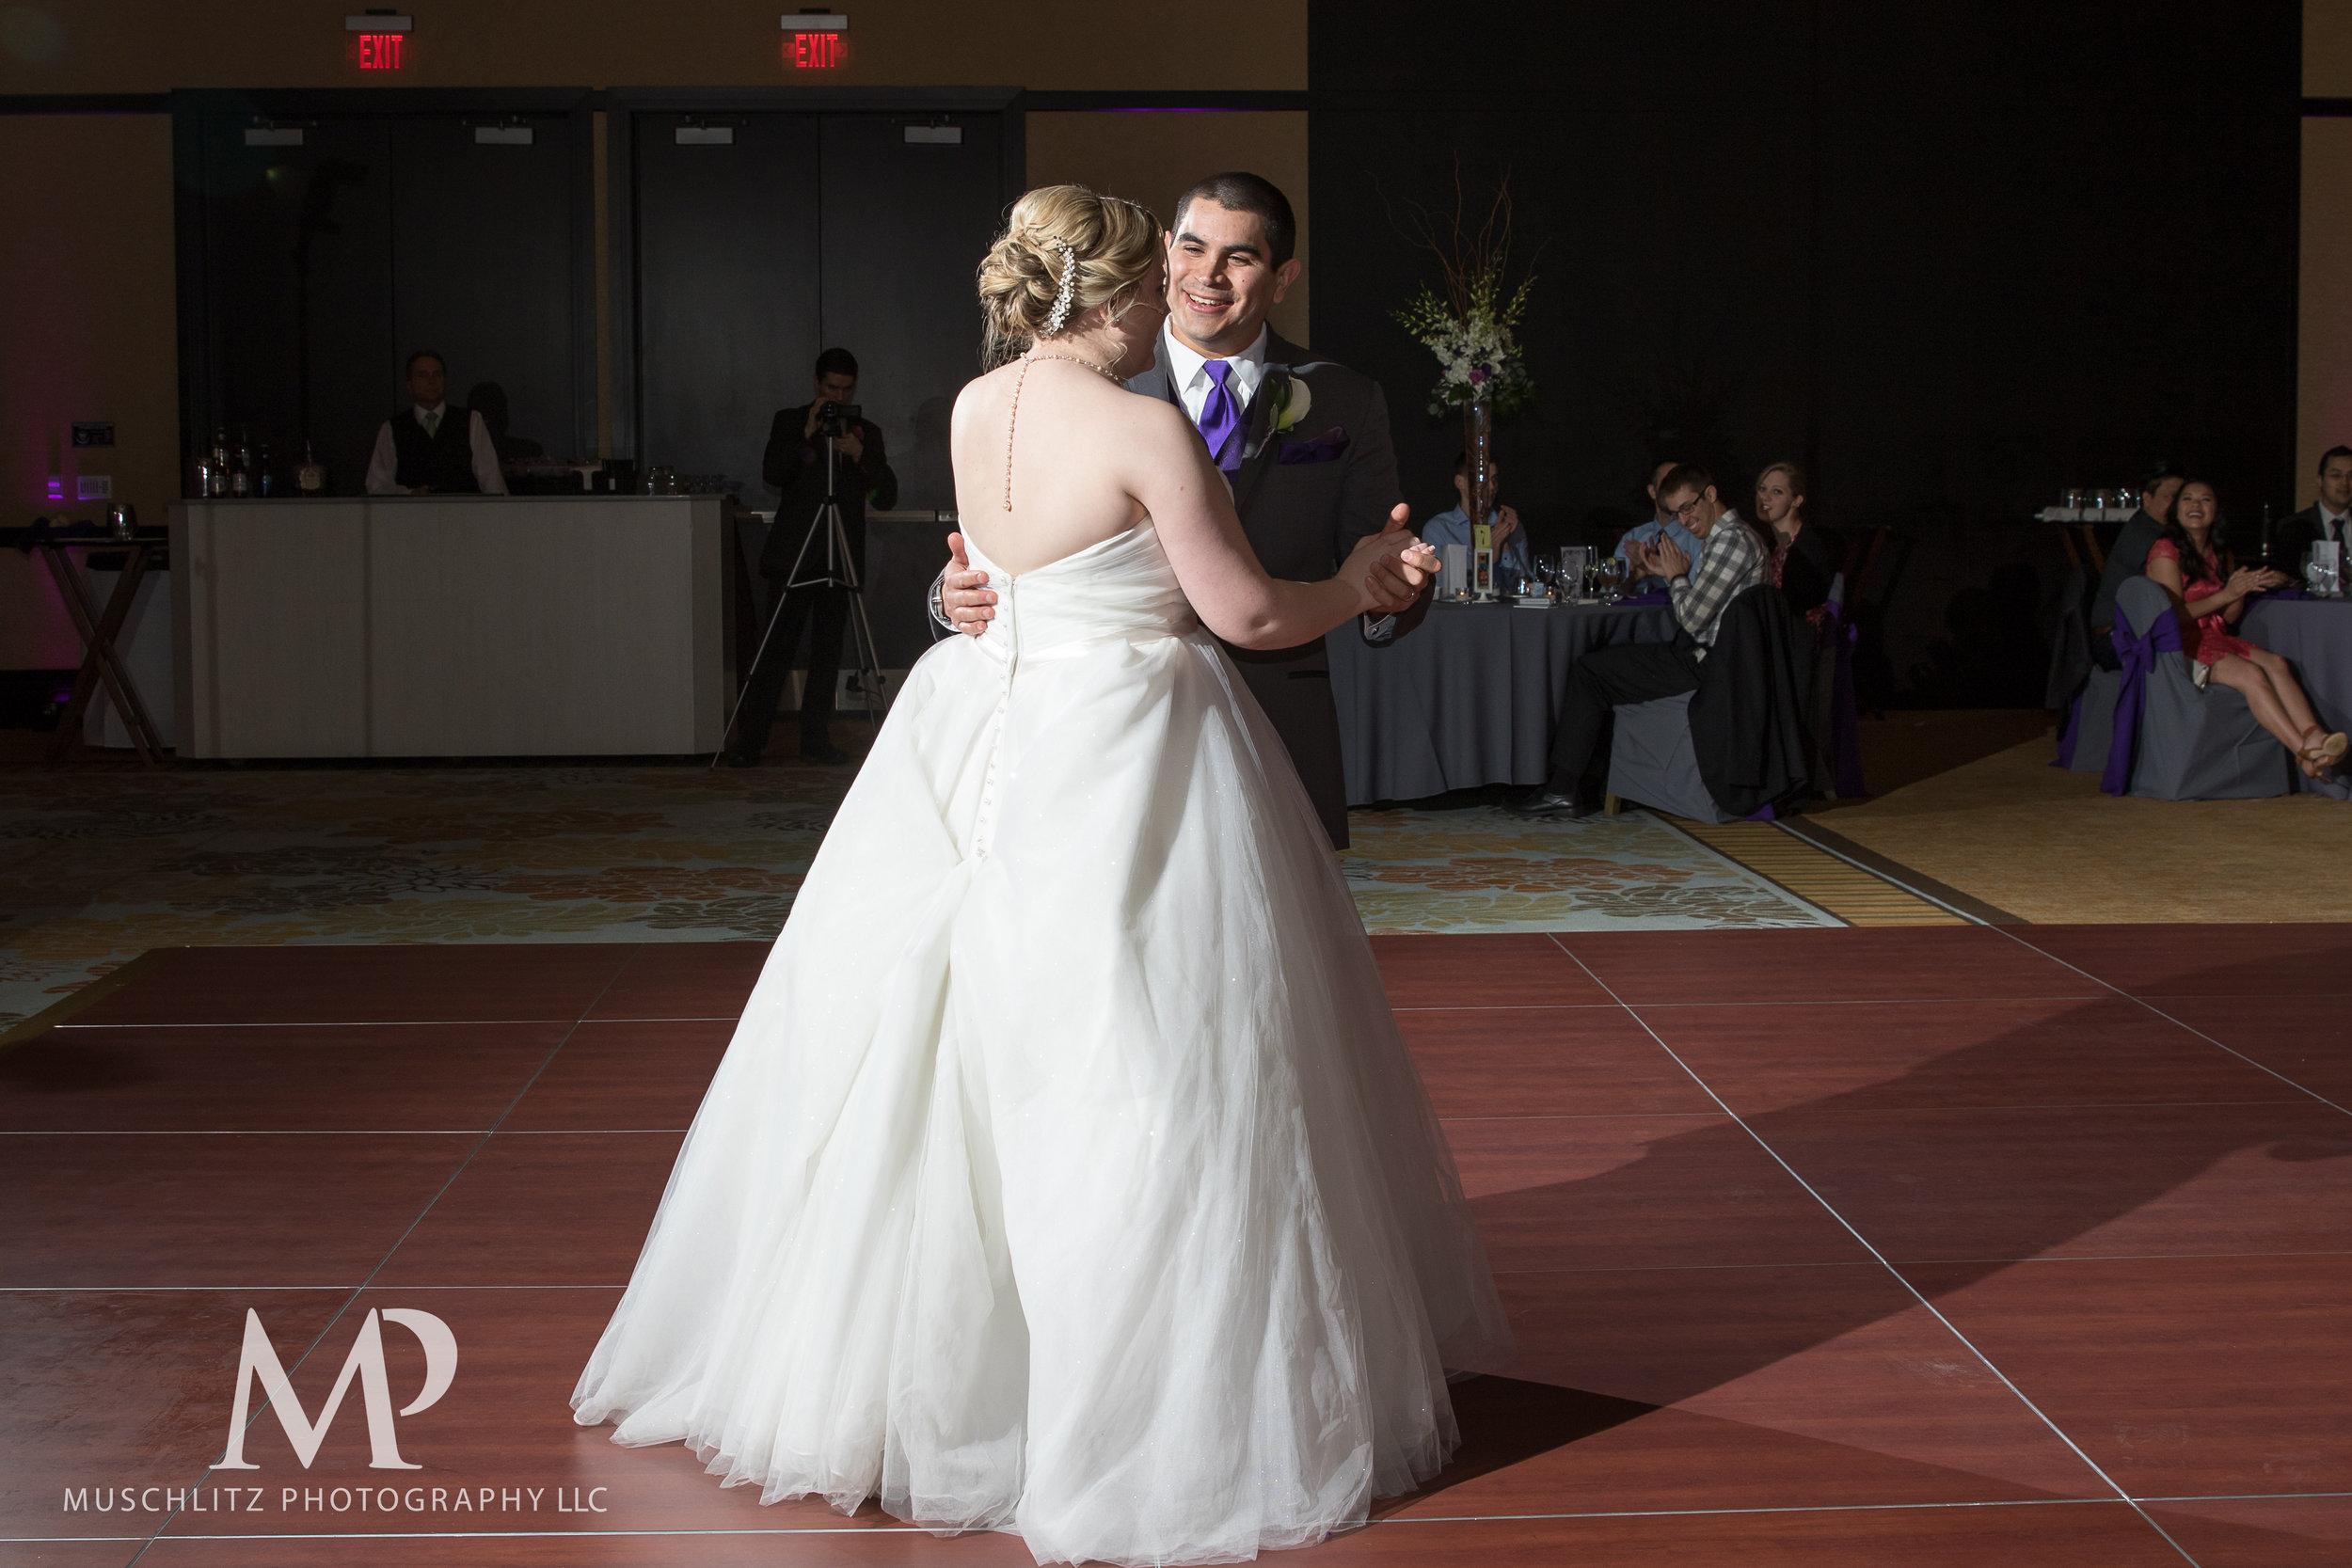 hilton-polaris-wedding-columbus-ohio-muschlitz-photography-052.JPG